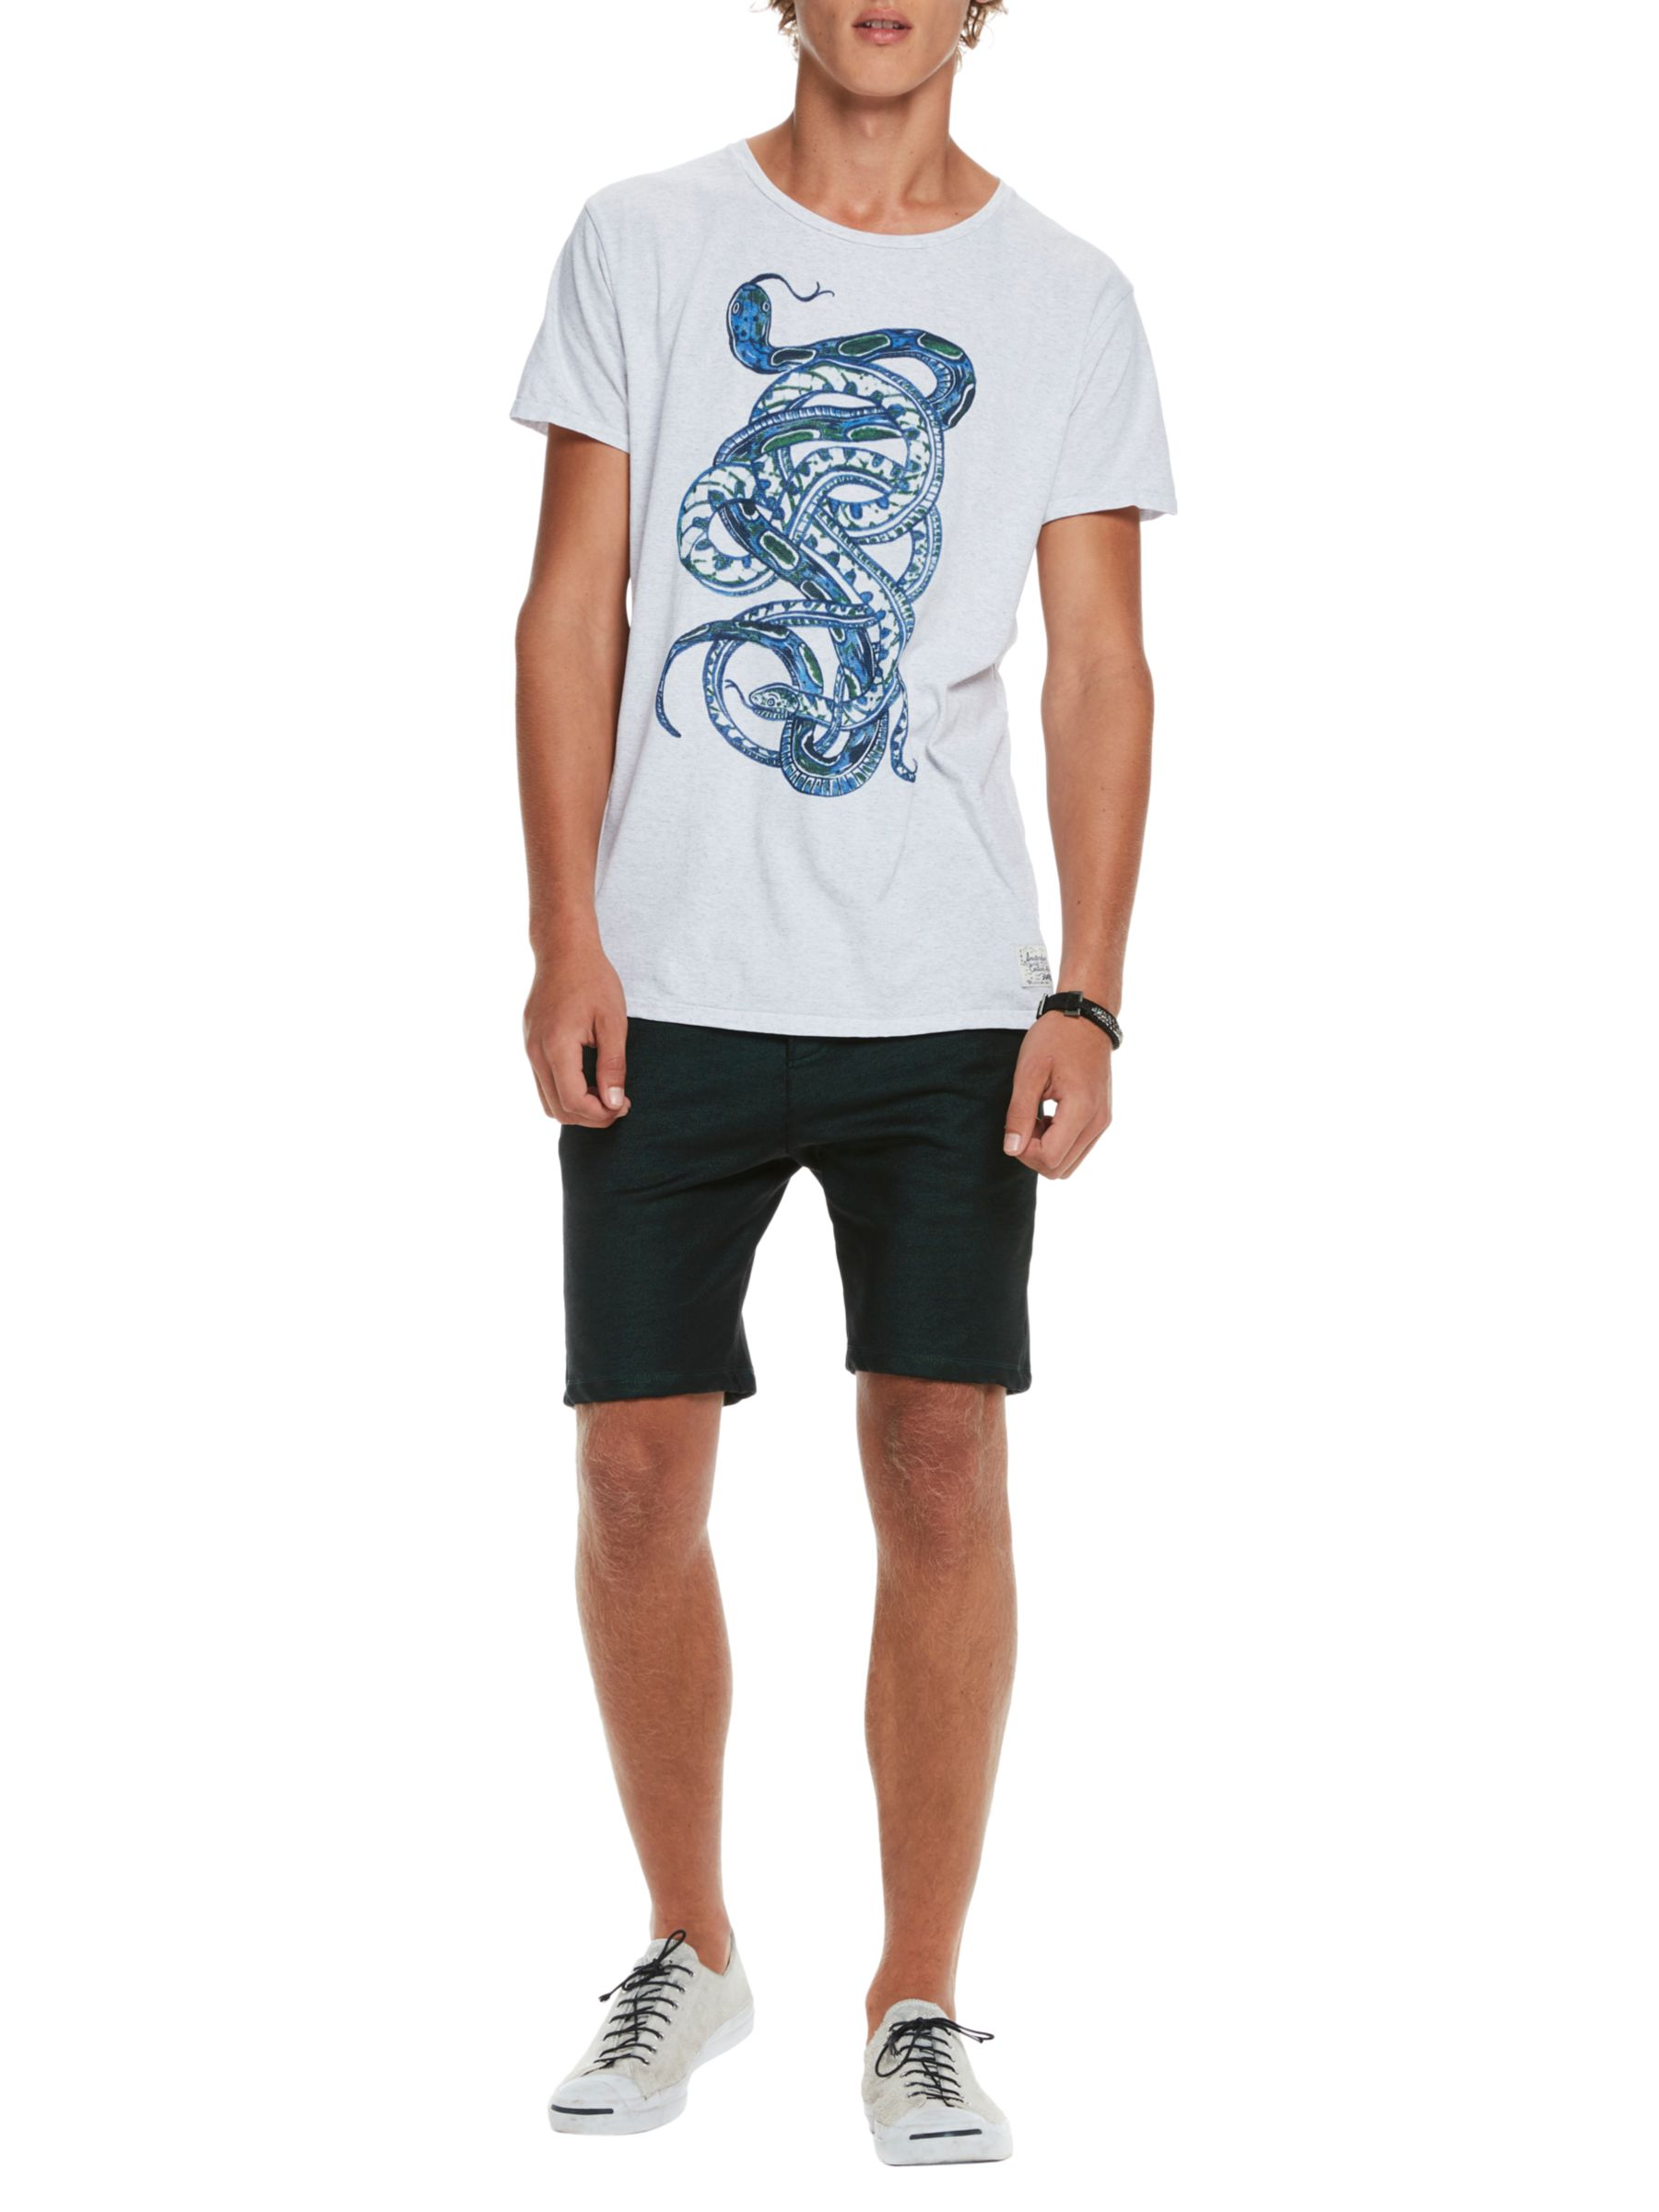 Scotch & Soda Scotch & Soda Snake Print T-Shirt, White